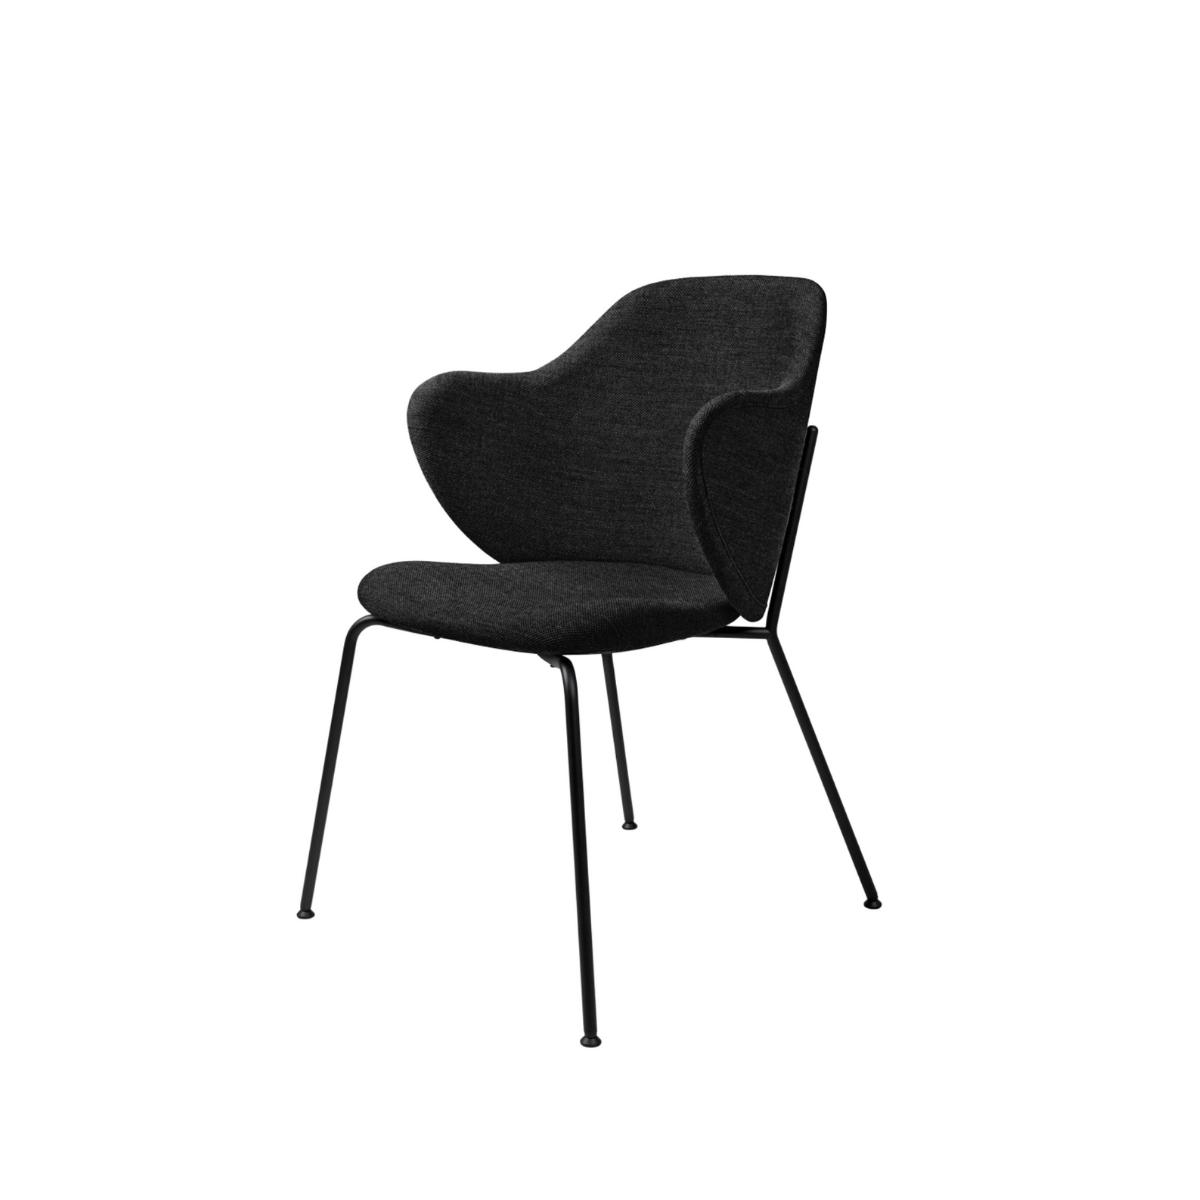 By Lassen   Lassen Chair - Hallingdal - Bolighuset Werenberg